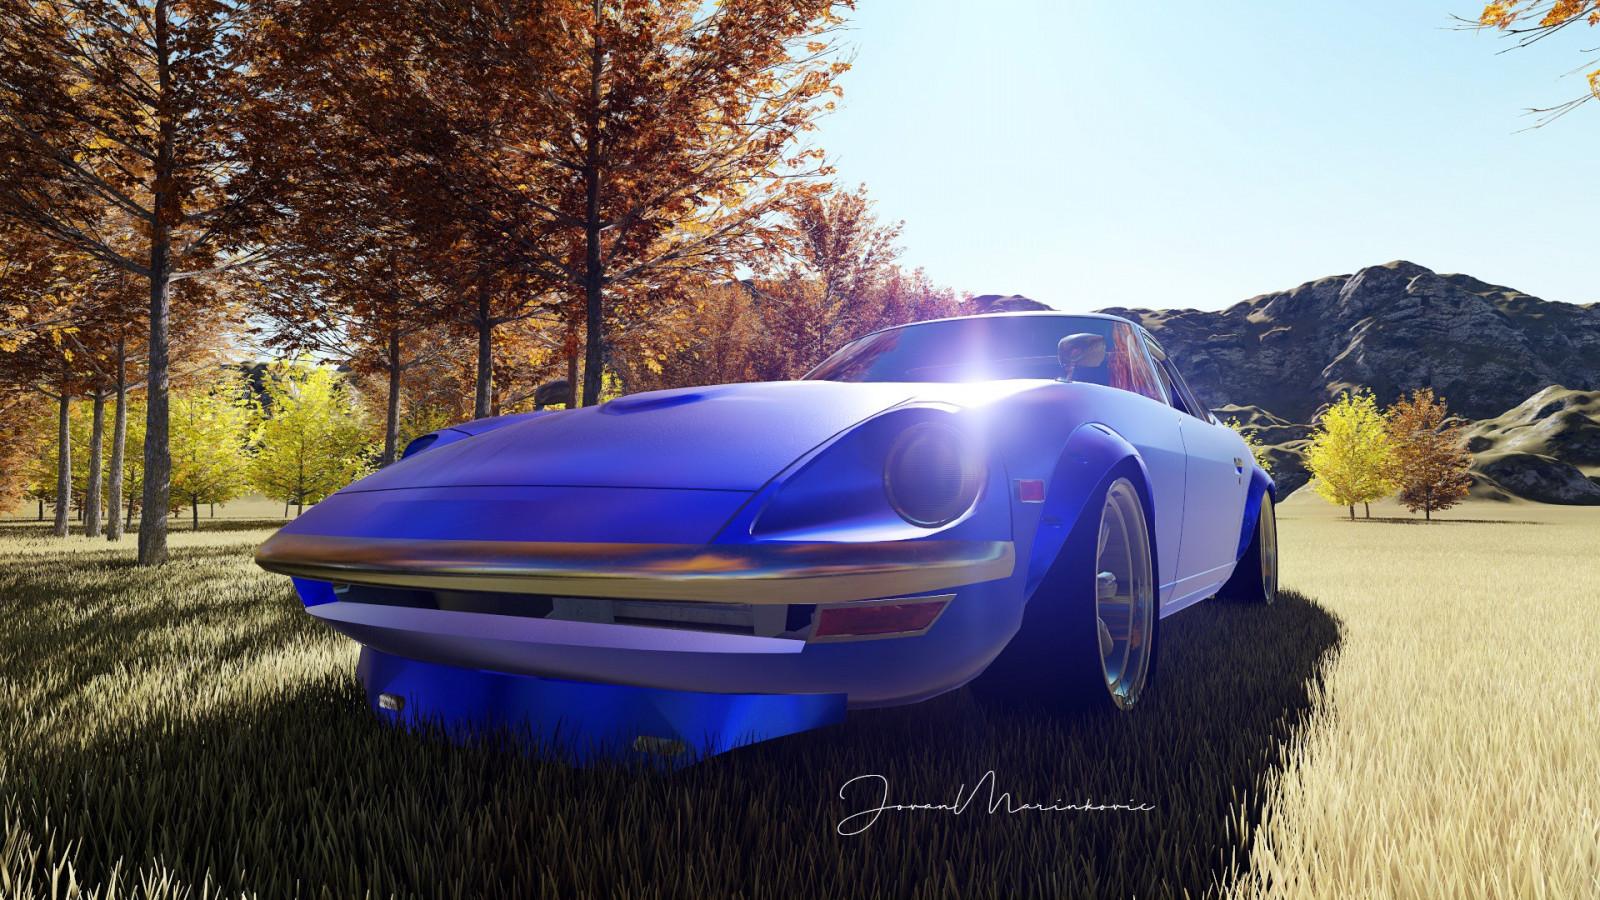 Nissan Fairlady Z >> デスクトップ壁紙 : 日産フェアレディZ, s30, 日本の自動車, 3D, レンダリングする, 青い車, ポルシェ ...